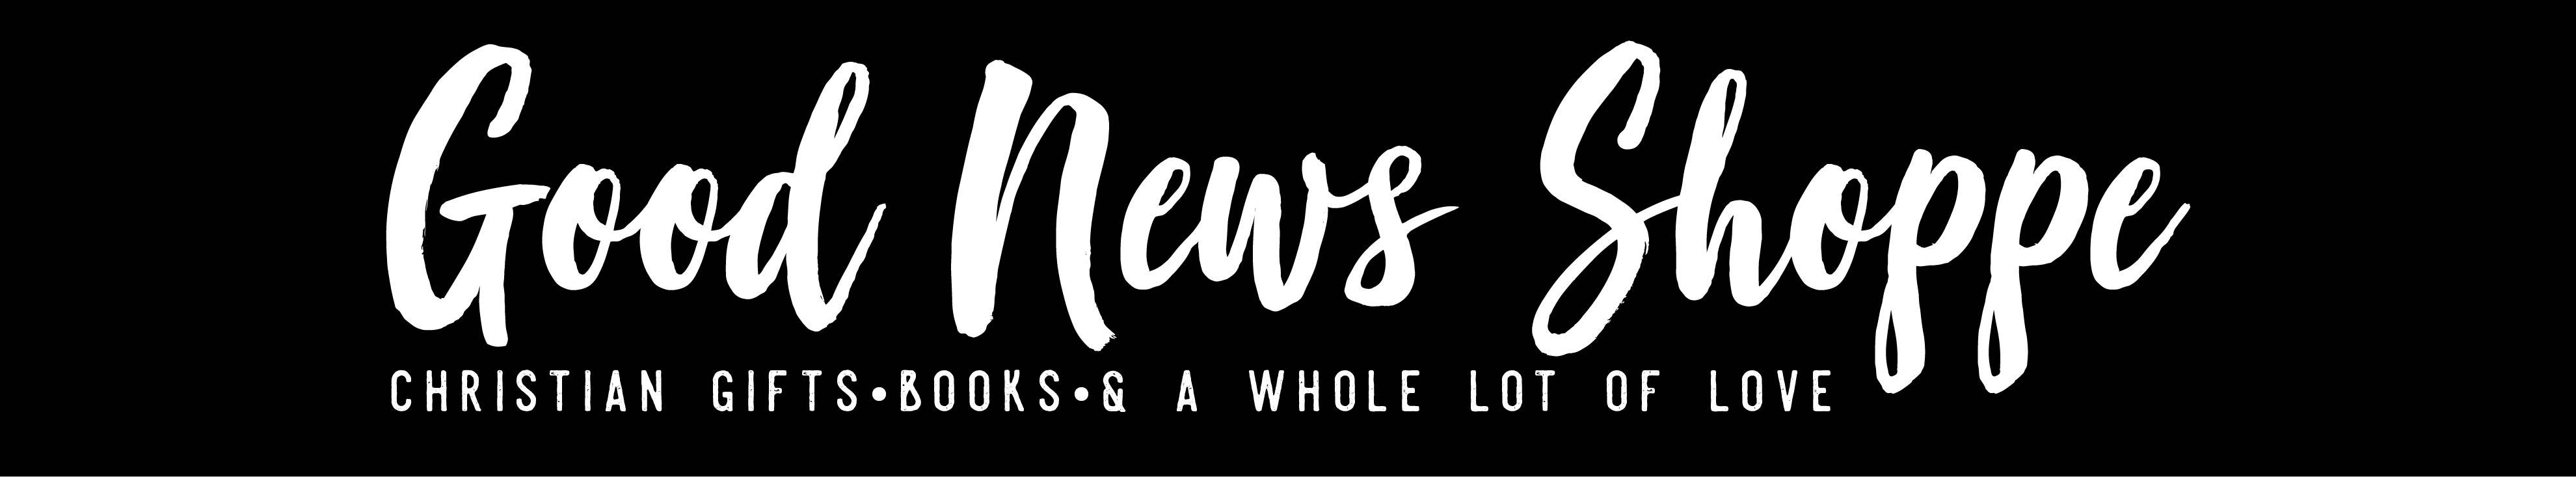 The Good News Shoppe